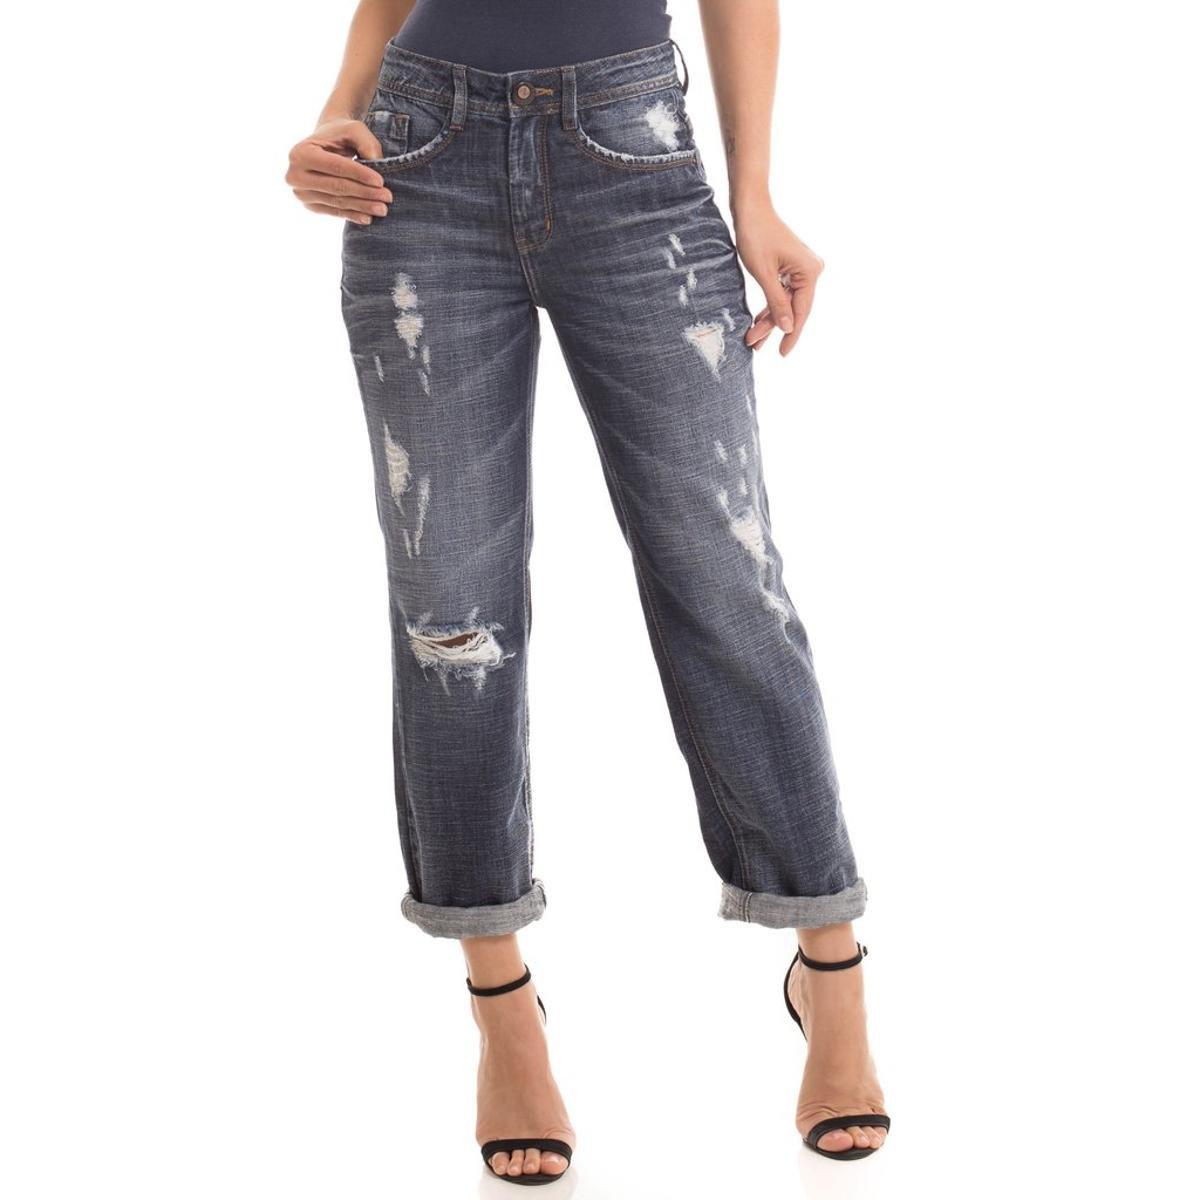 9e6bcf4fd Calça Jeans Osmoze High Straight Feminina - Compre Agora | Zattini